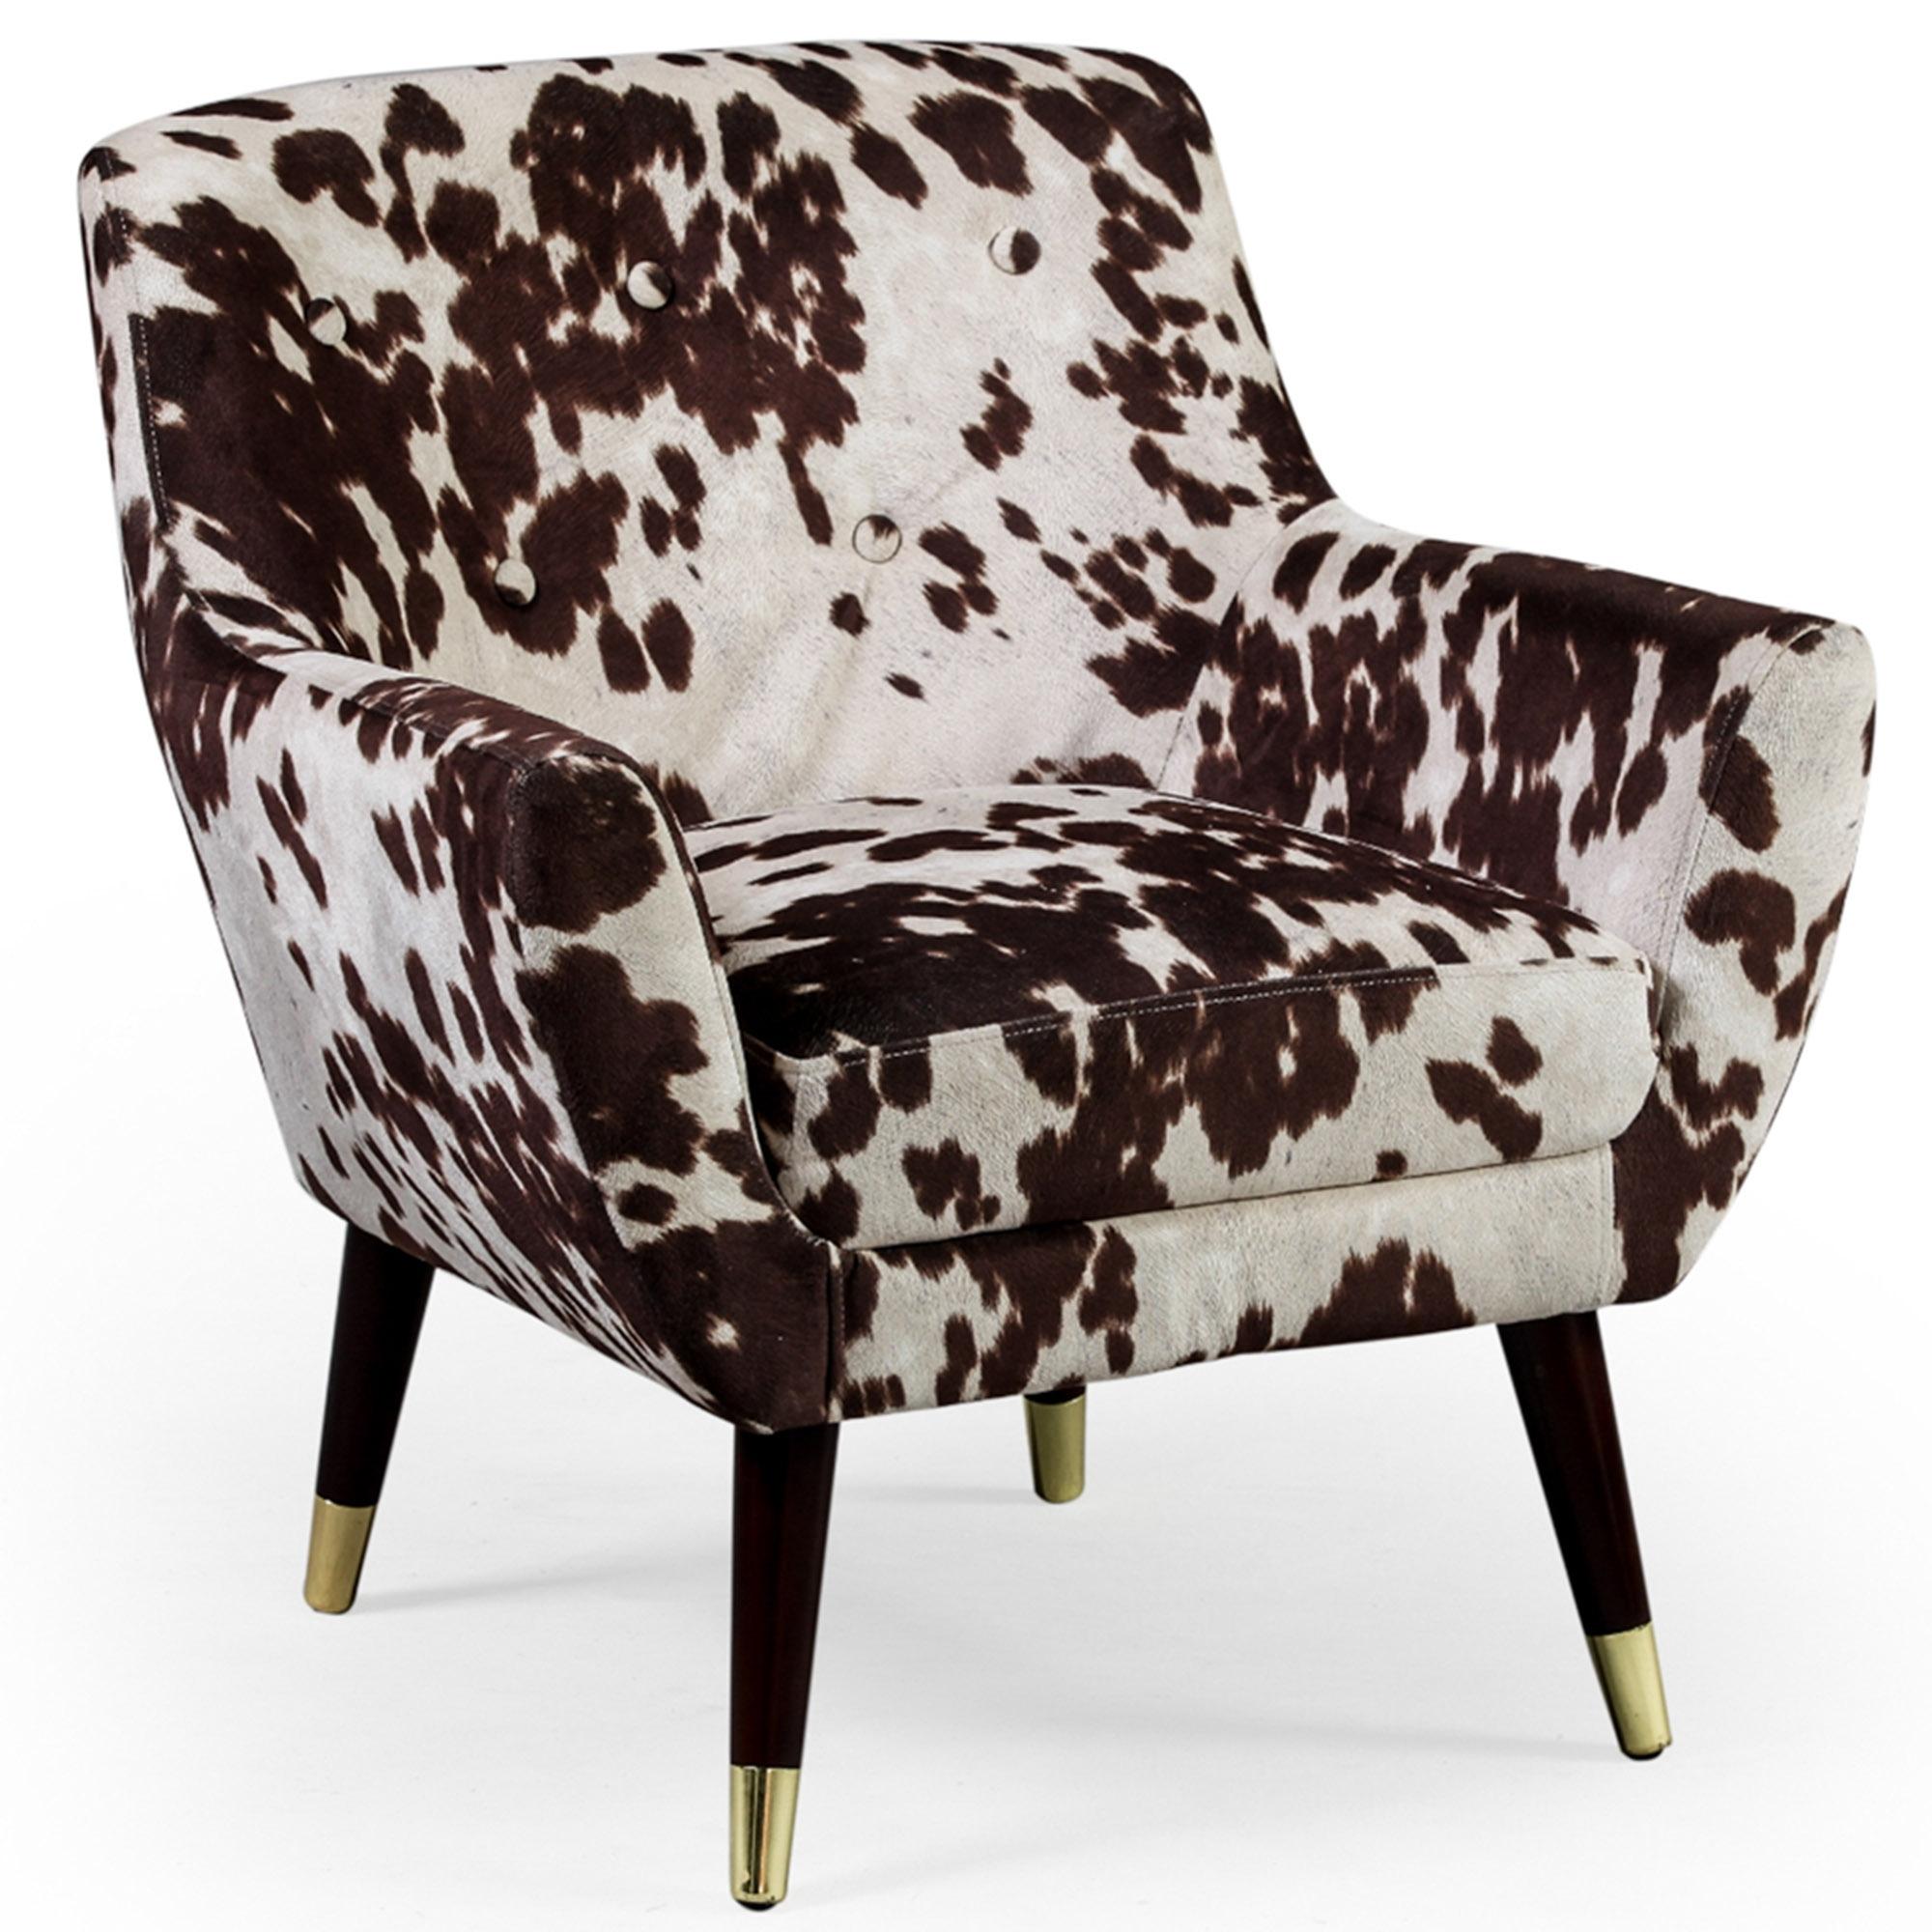 Brown Cowhide Retro Armchair Armchair Homesdirect365